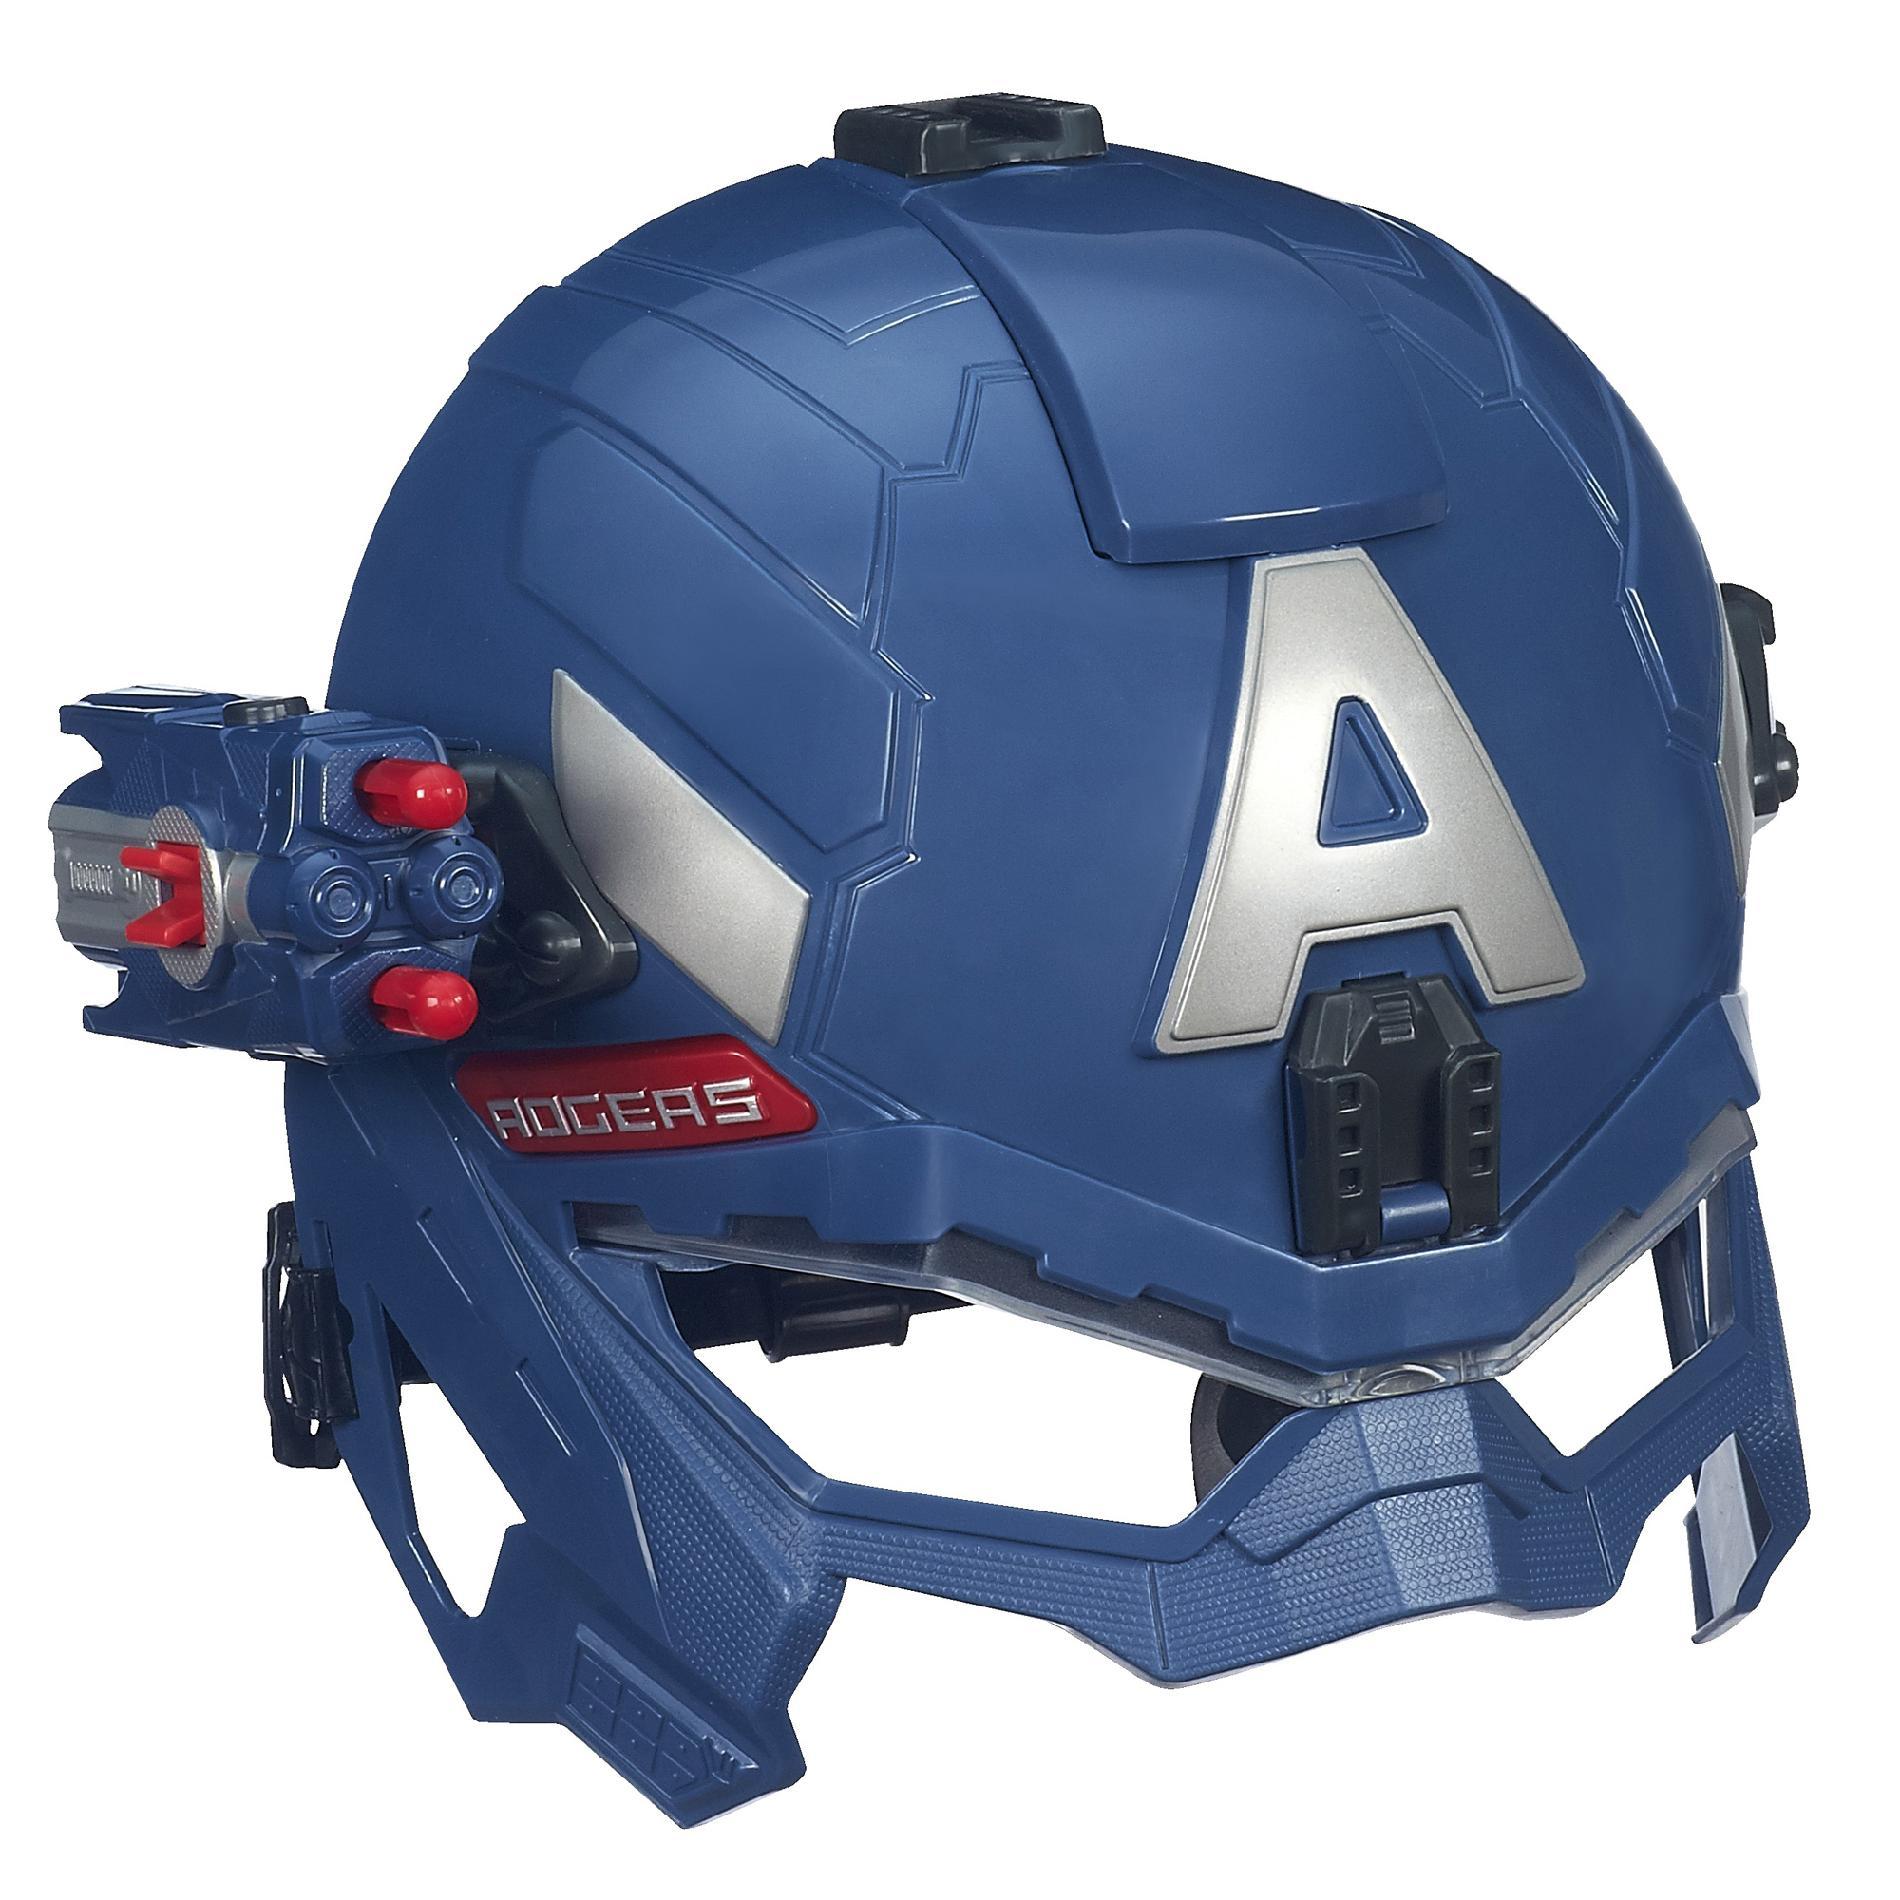 combat helmet upgradetbibrain injurymiltarycharity